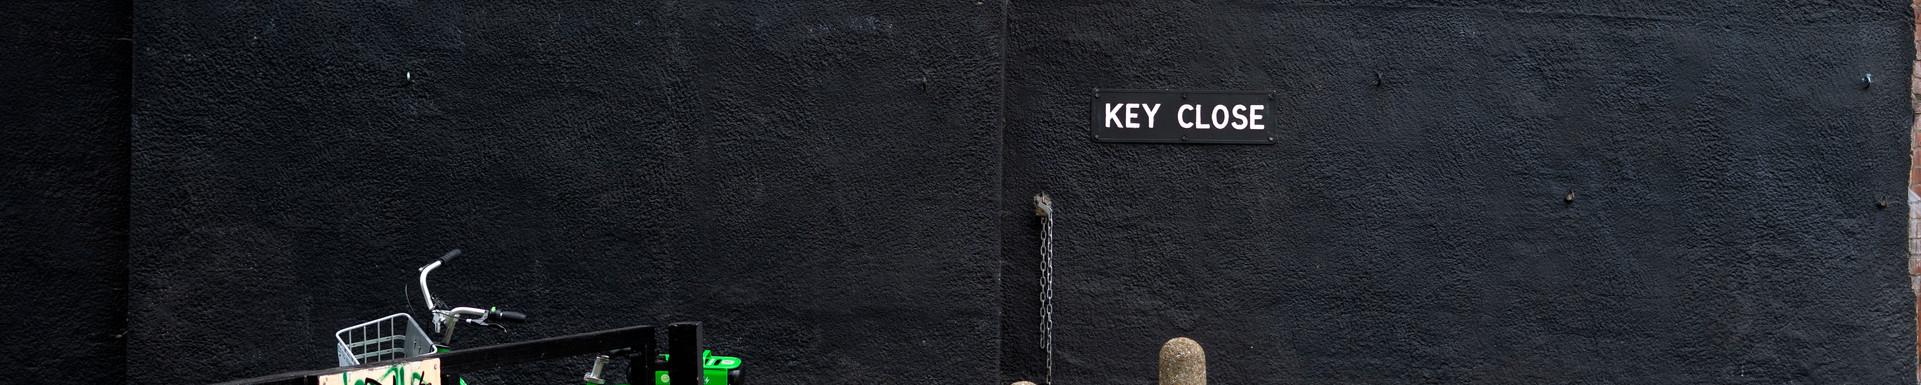 Key Close